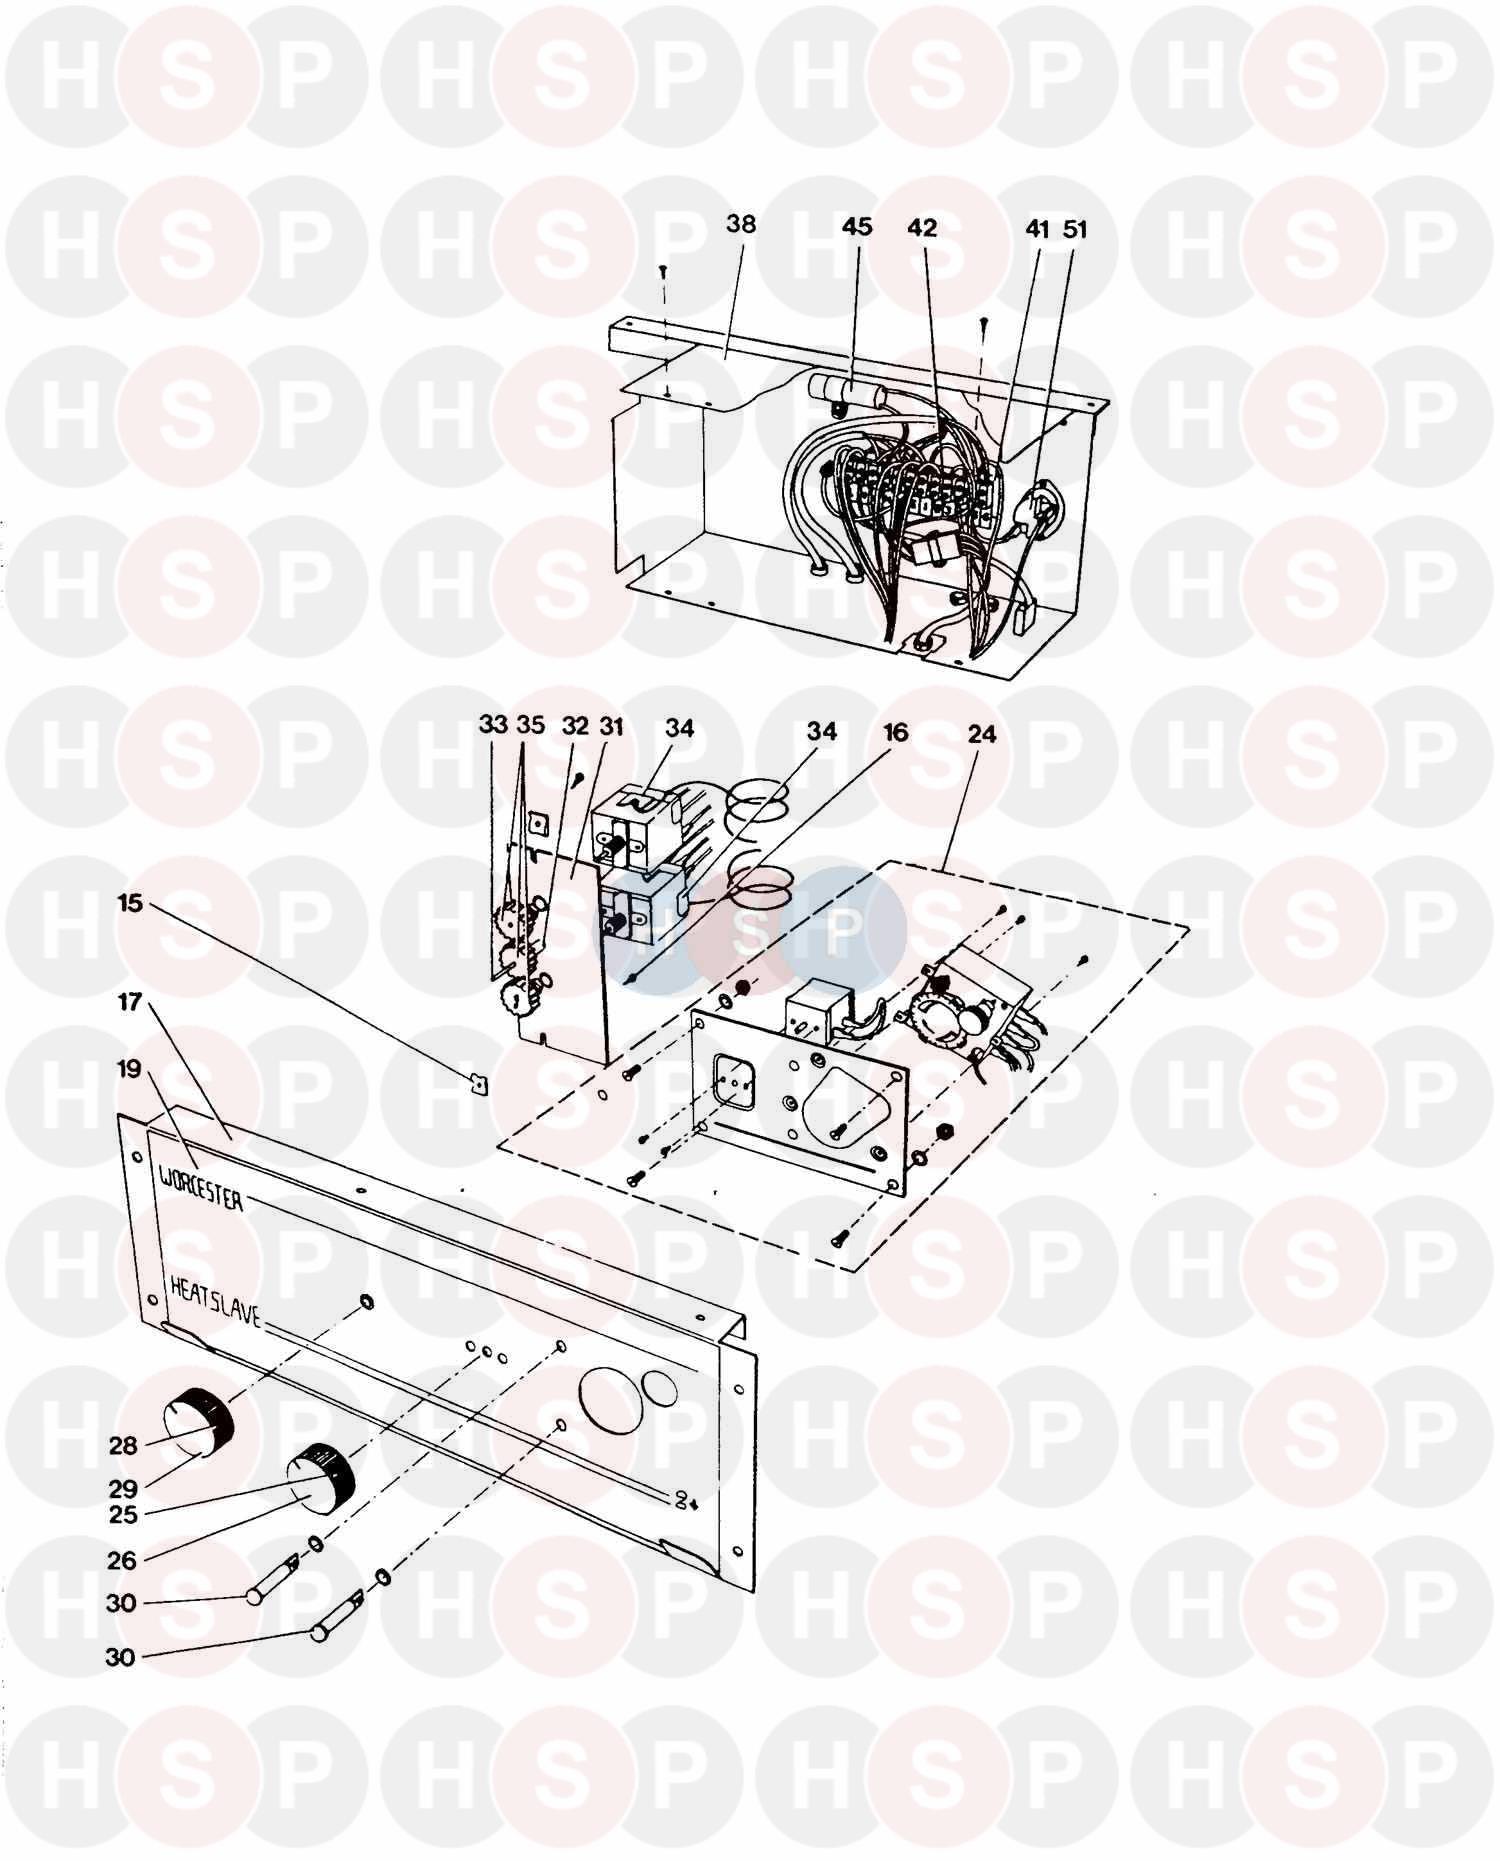 Worcester HEATSLAVE 2+ G40 BF DELUXE Appliance Diagram